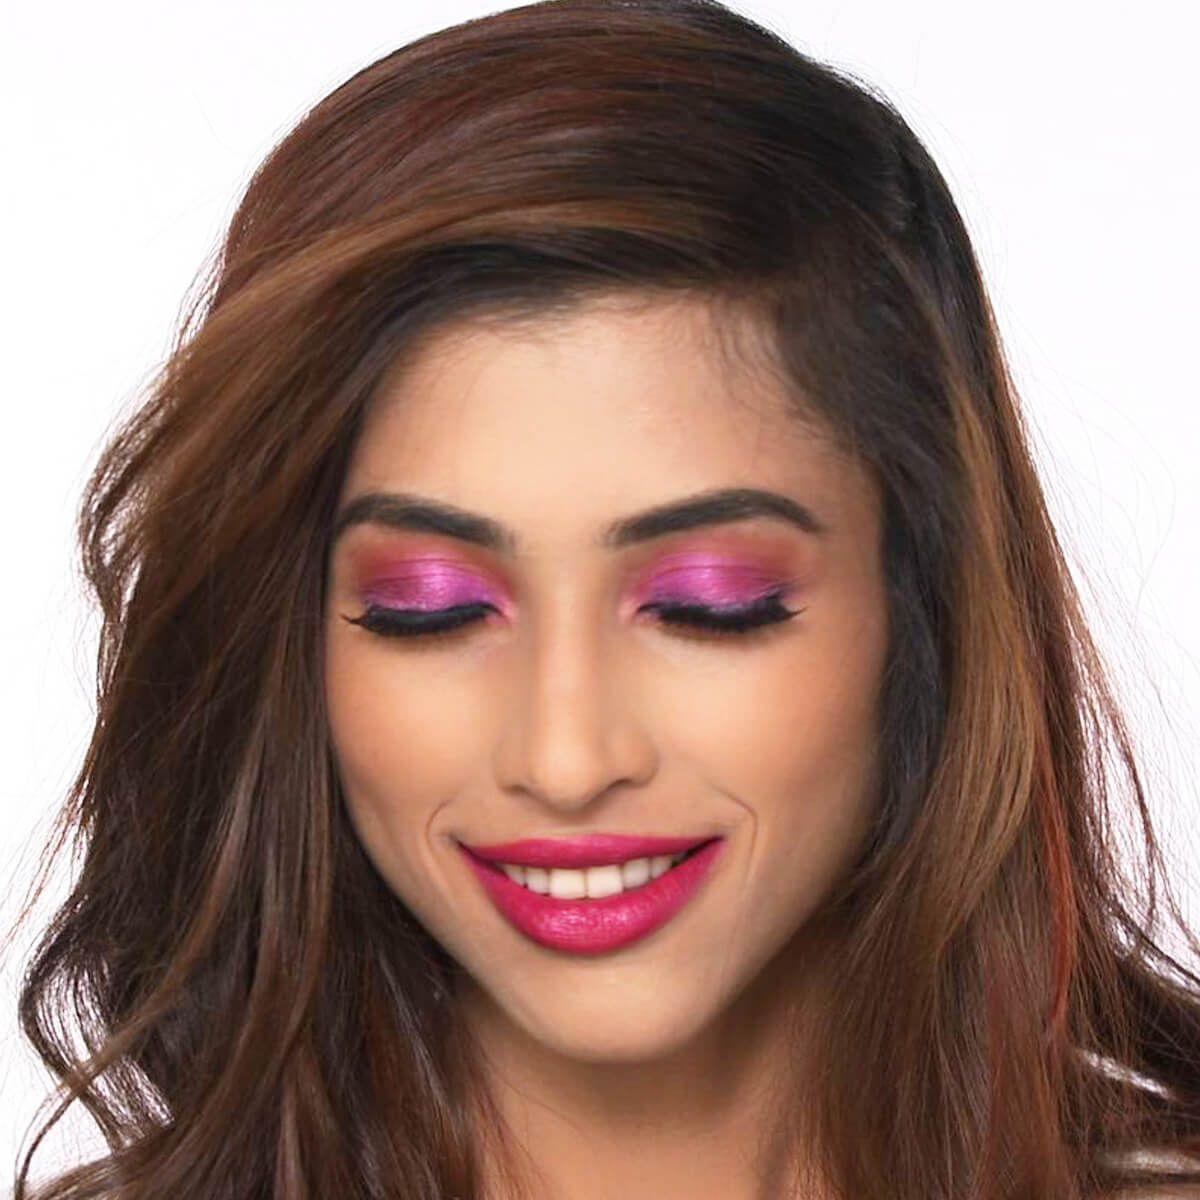 Priyanka Chopra's Pink Eye Makeup Look